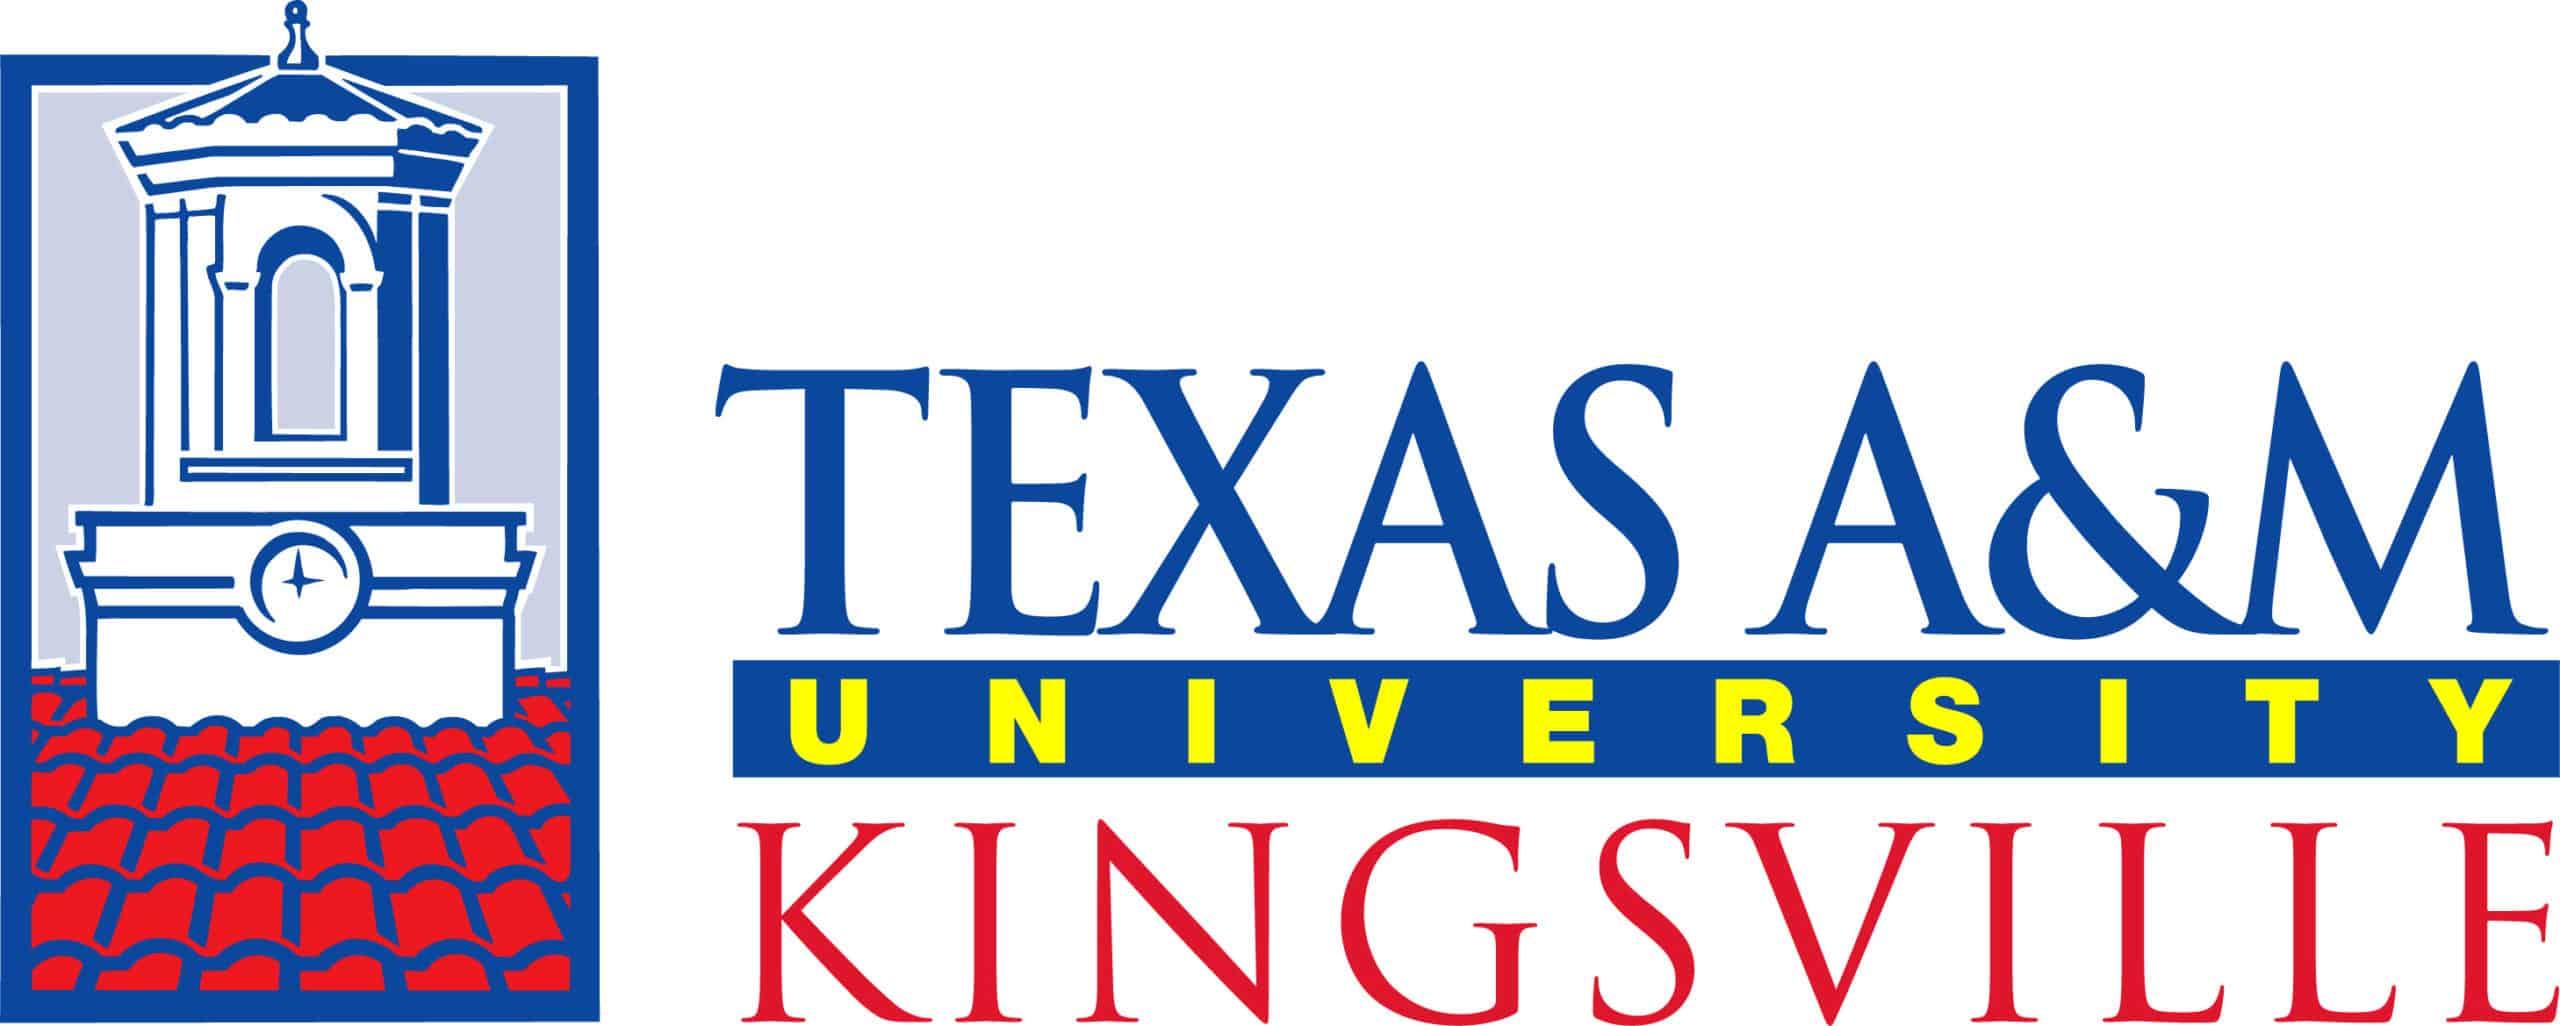 Texas A & M University – Kingsville